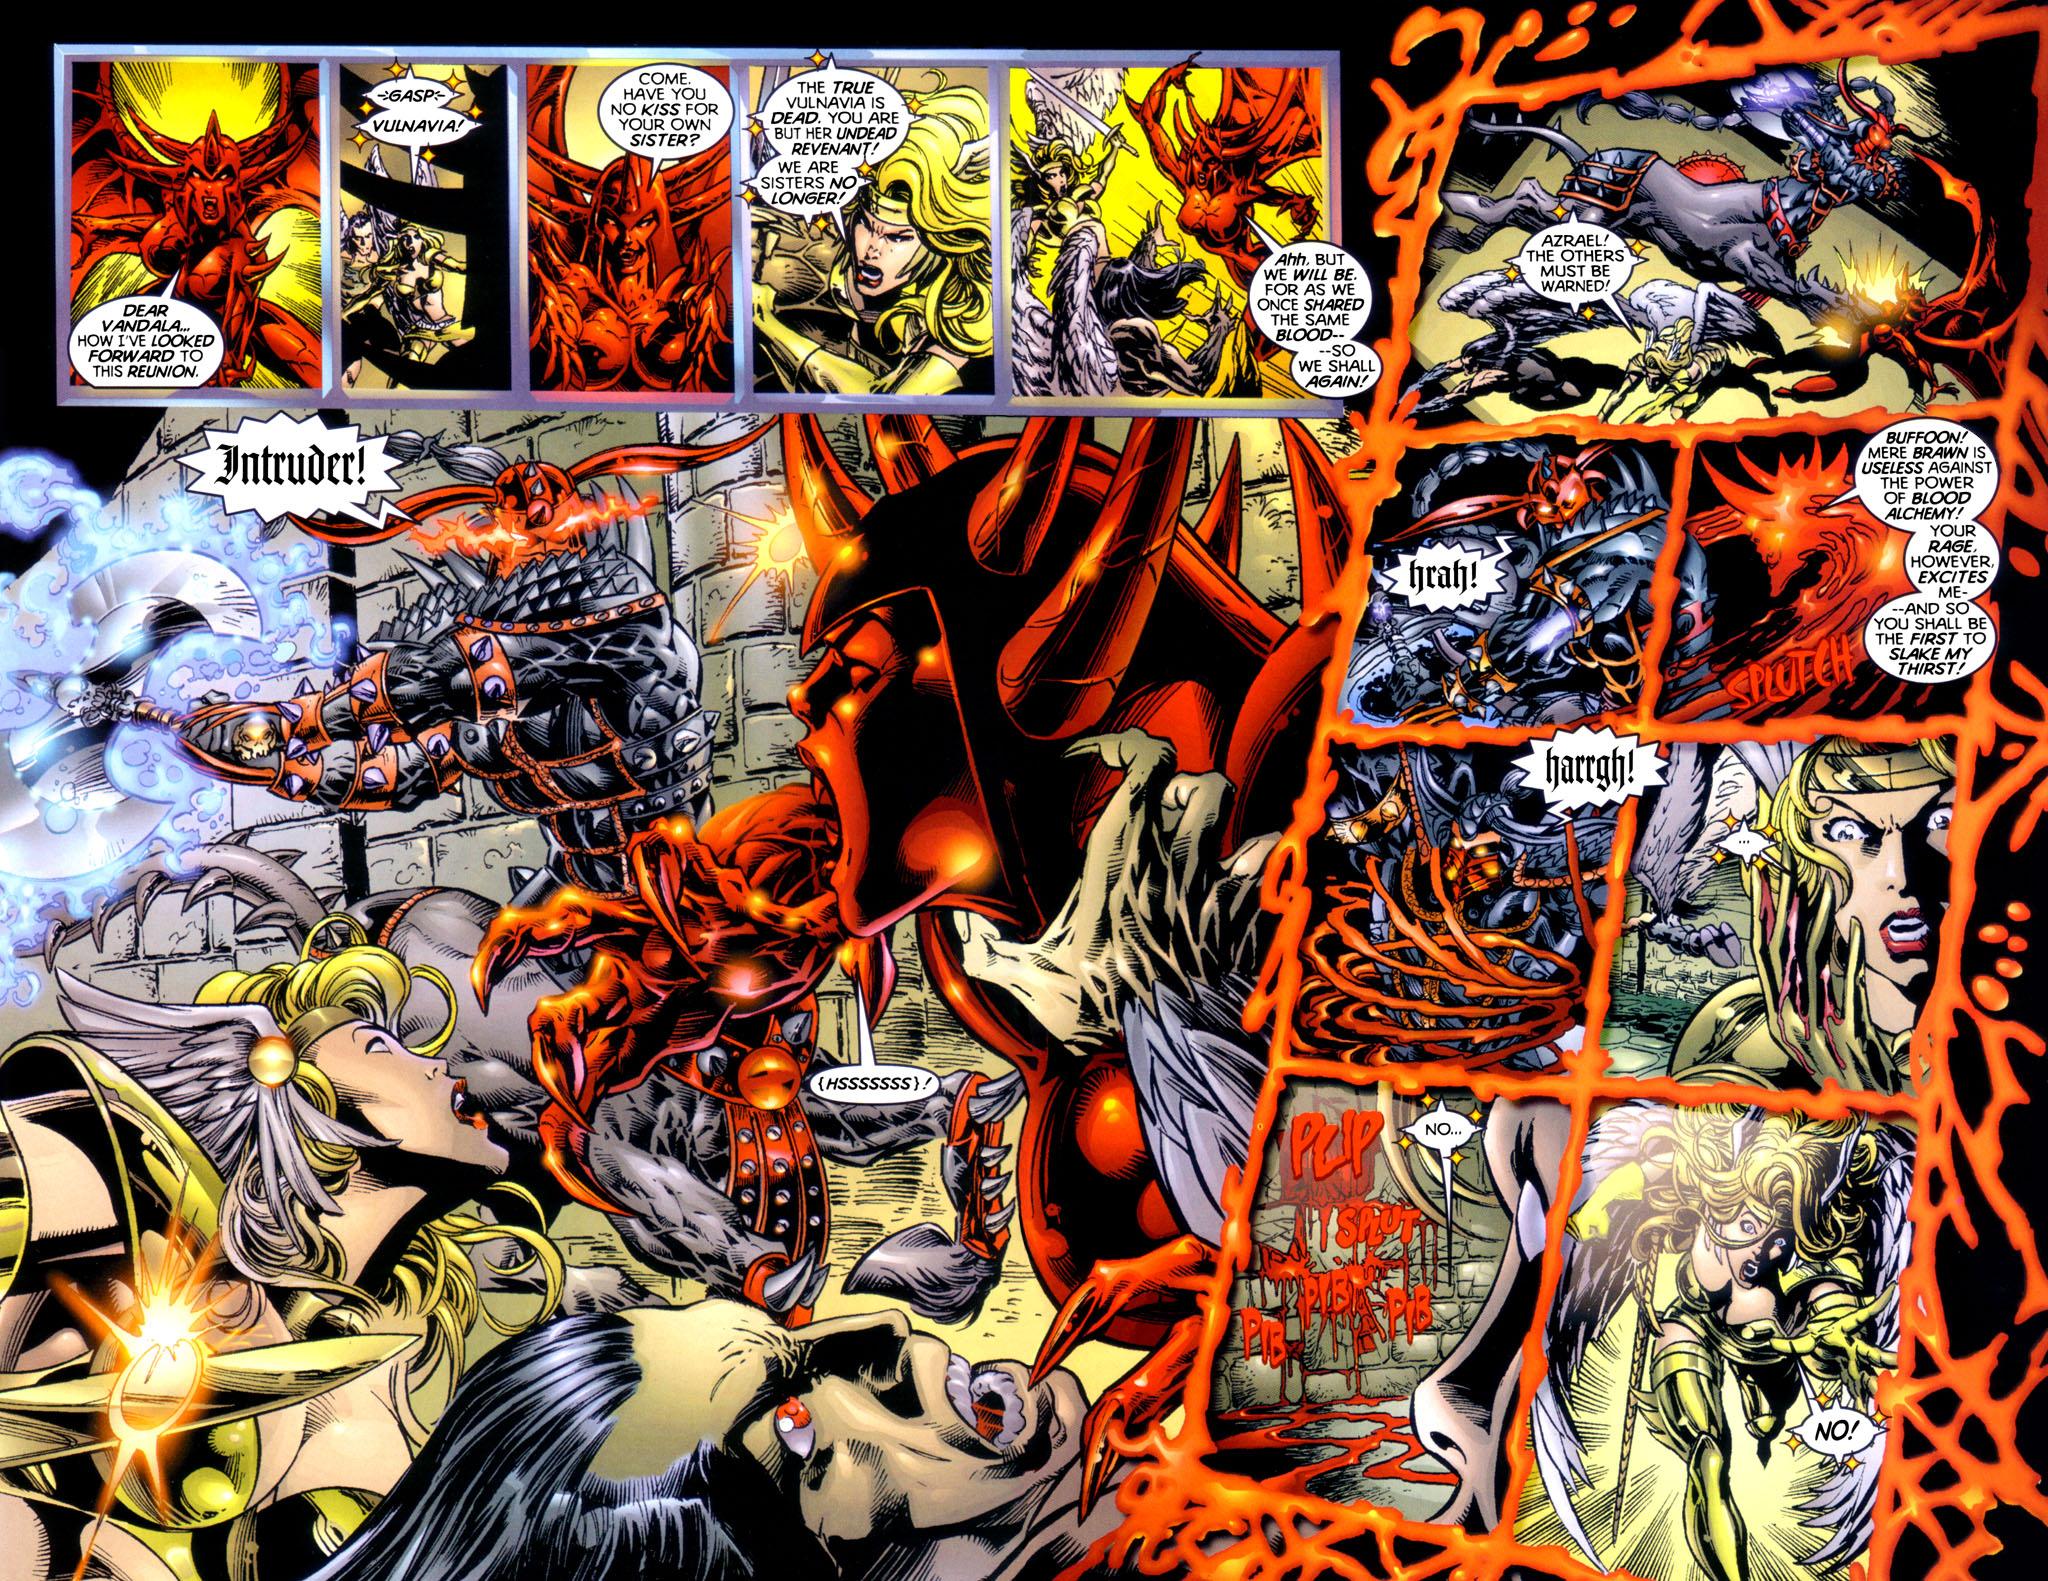 Read online Lady Death vs. Purgatori comic -  Issue # Full - 6